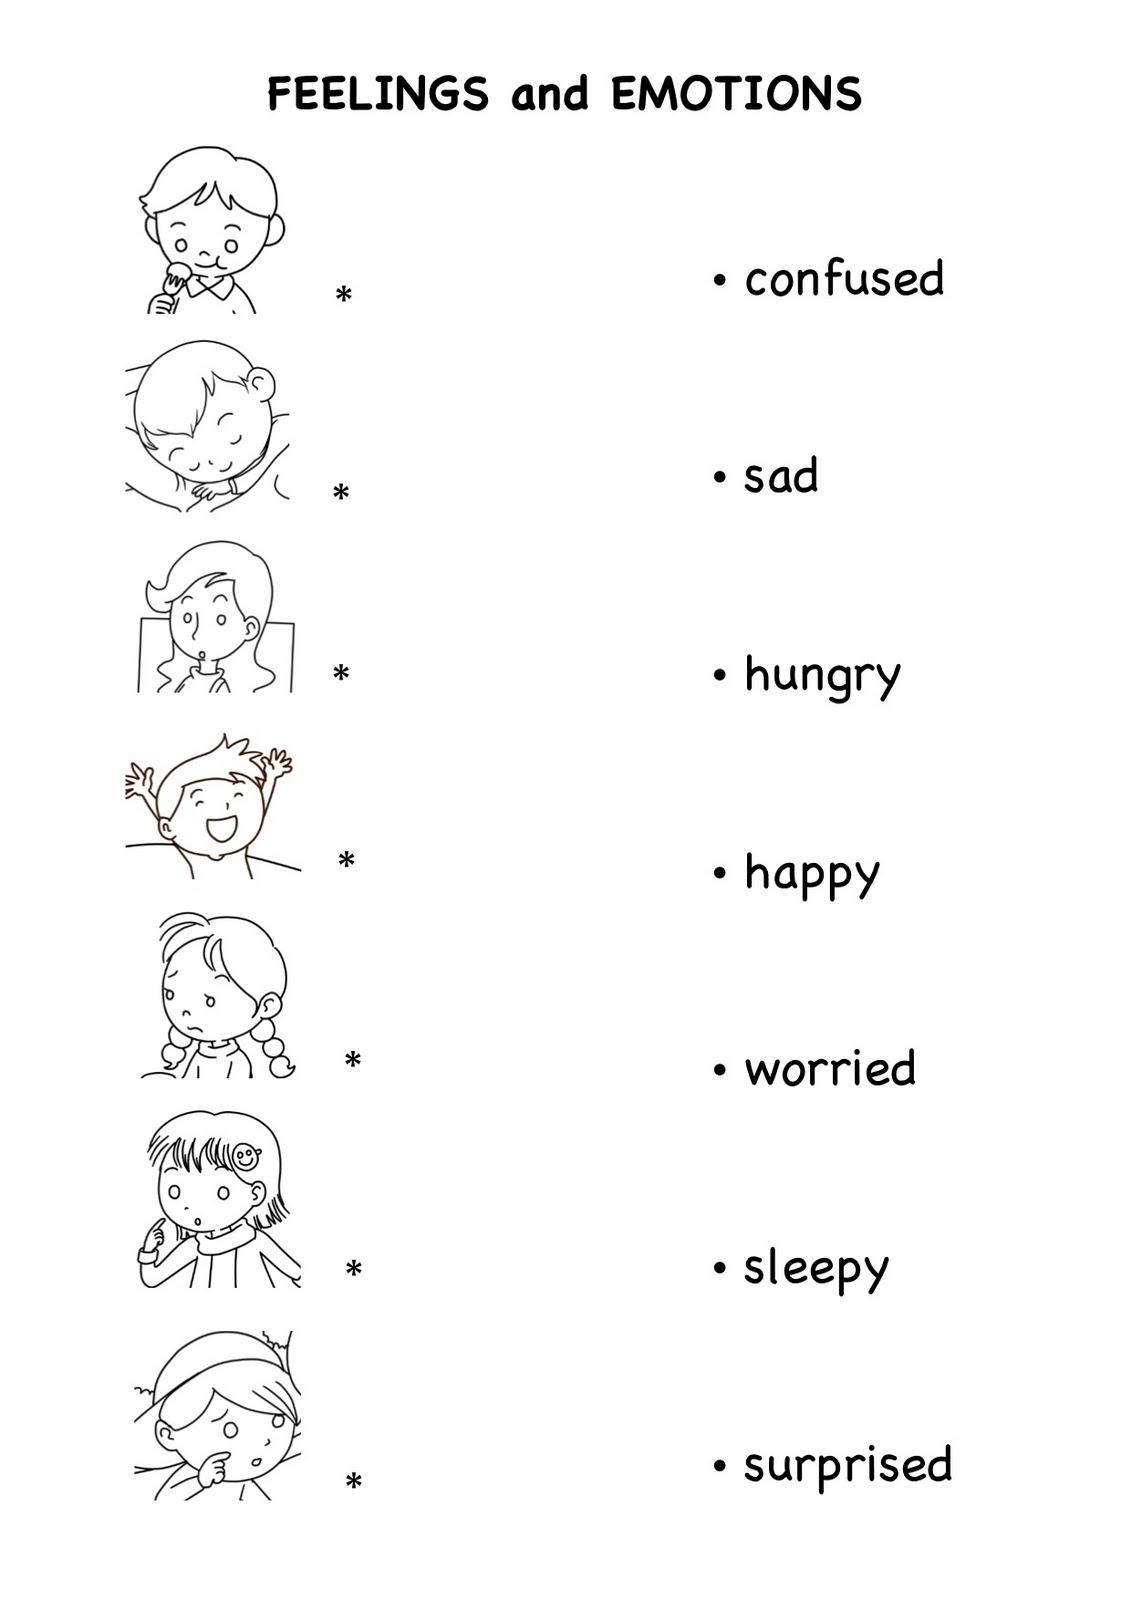 Uncategorized Feelings Worksheets 100 addiction worksheets pdf seeking safety handouts feeling quiz worksheet expressing emotions feelings picture